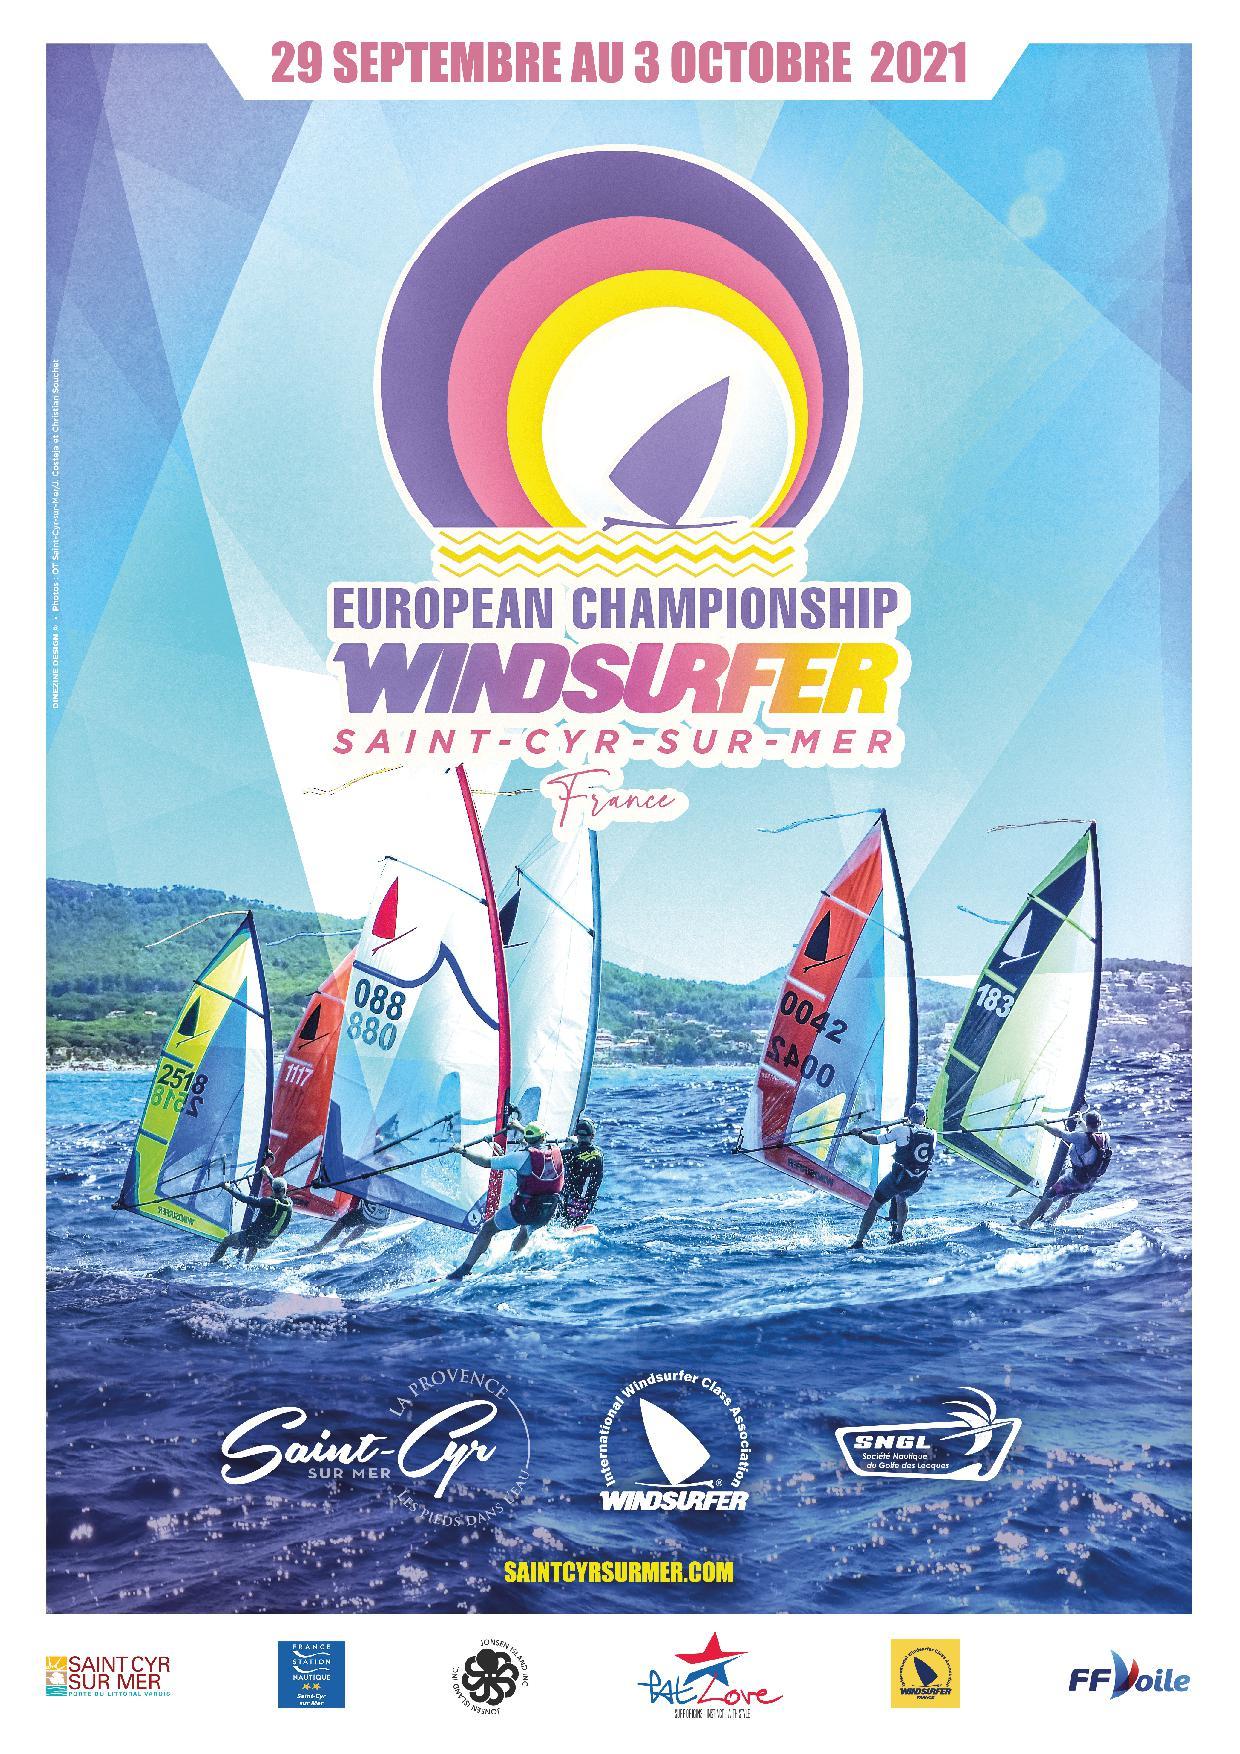 The European Championship Windsurfer